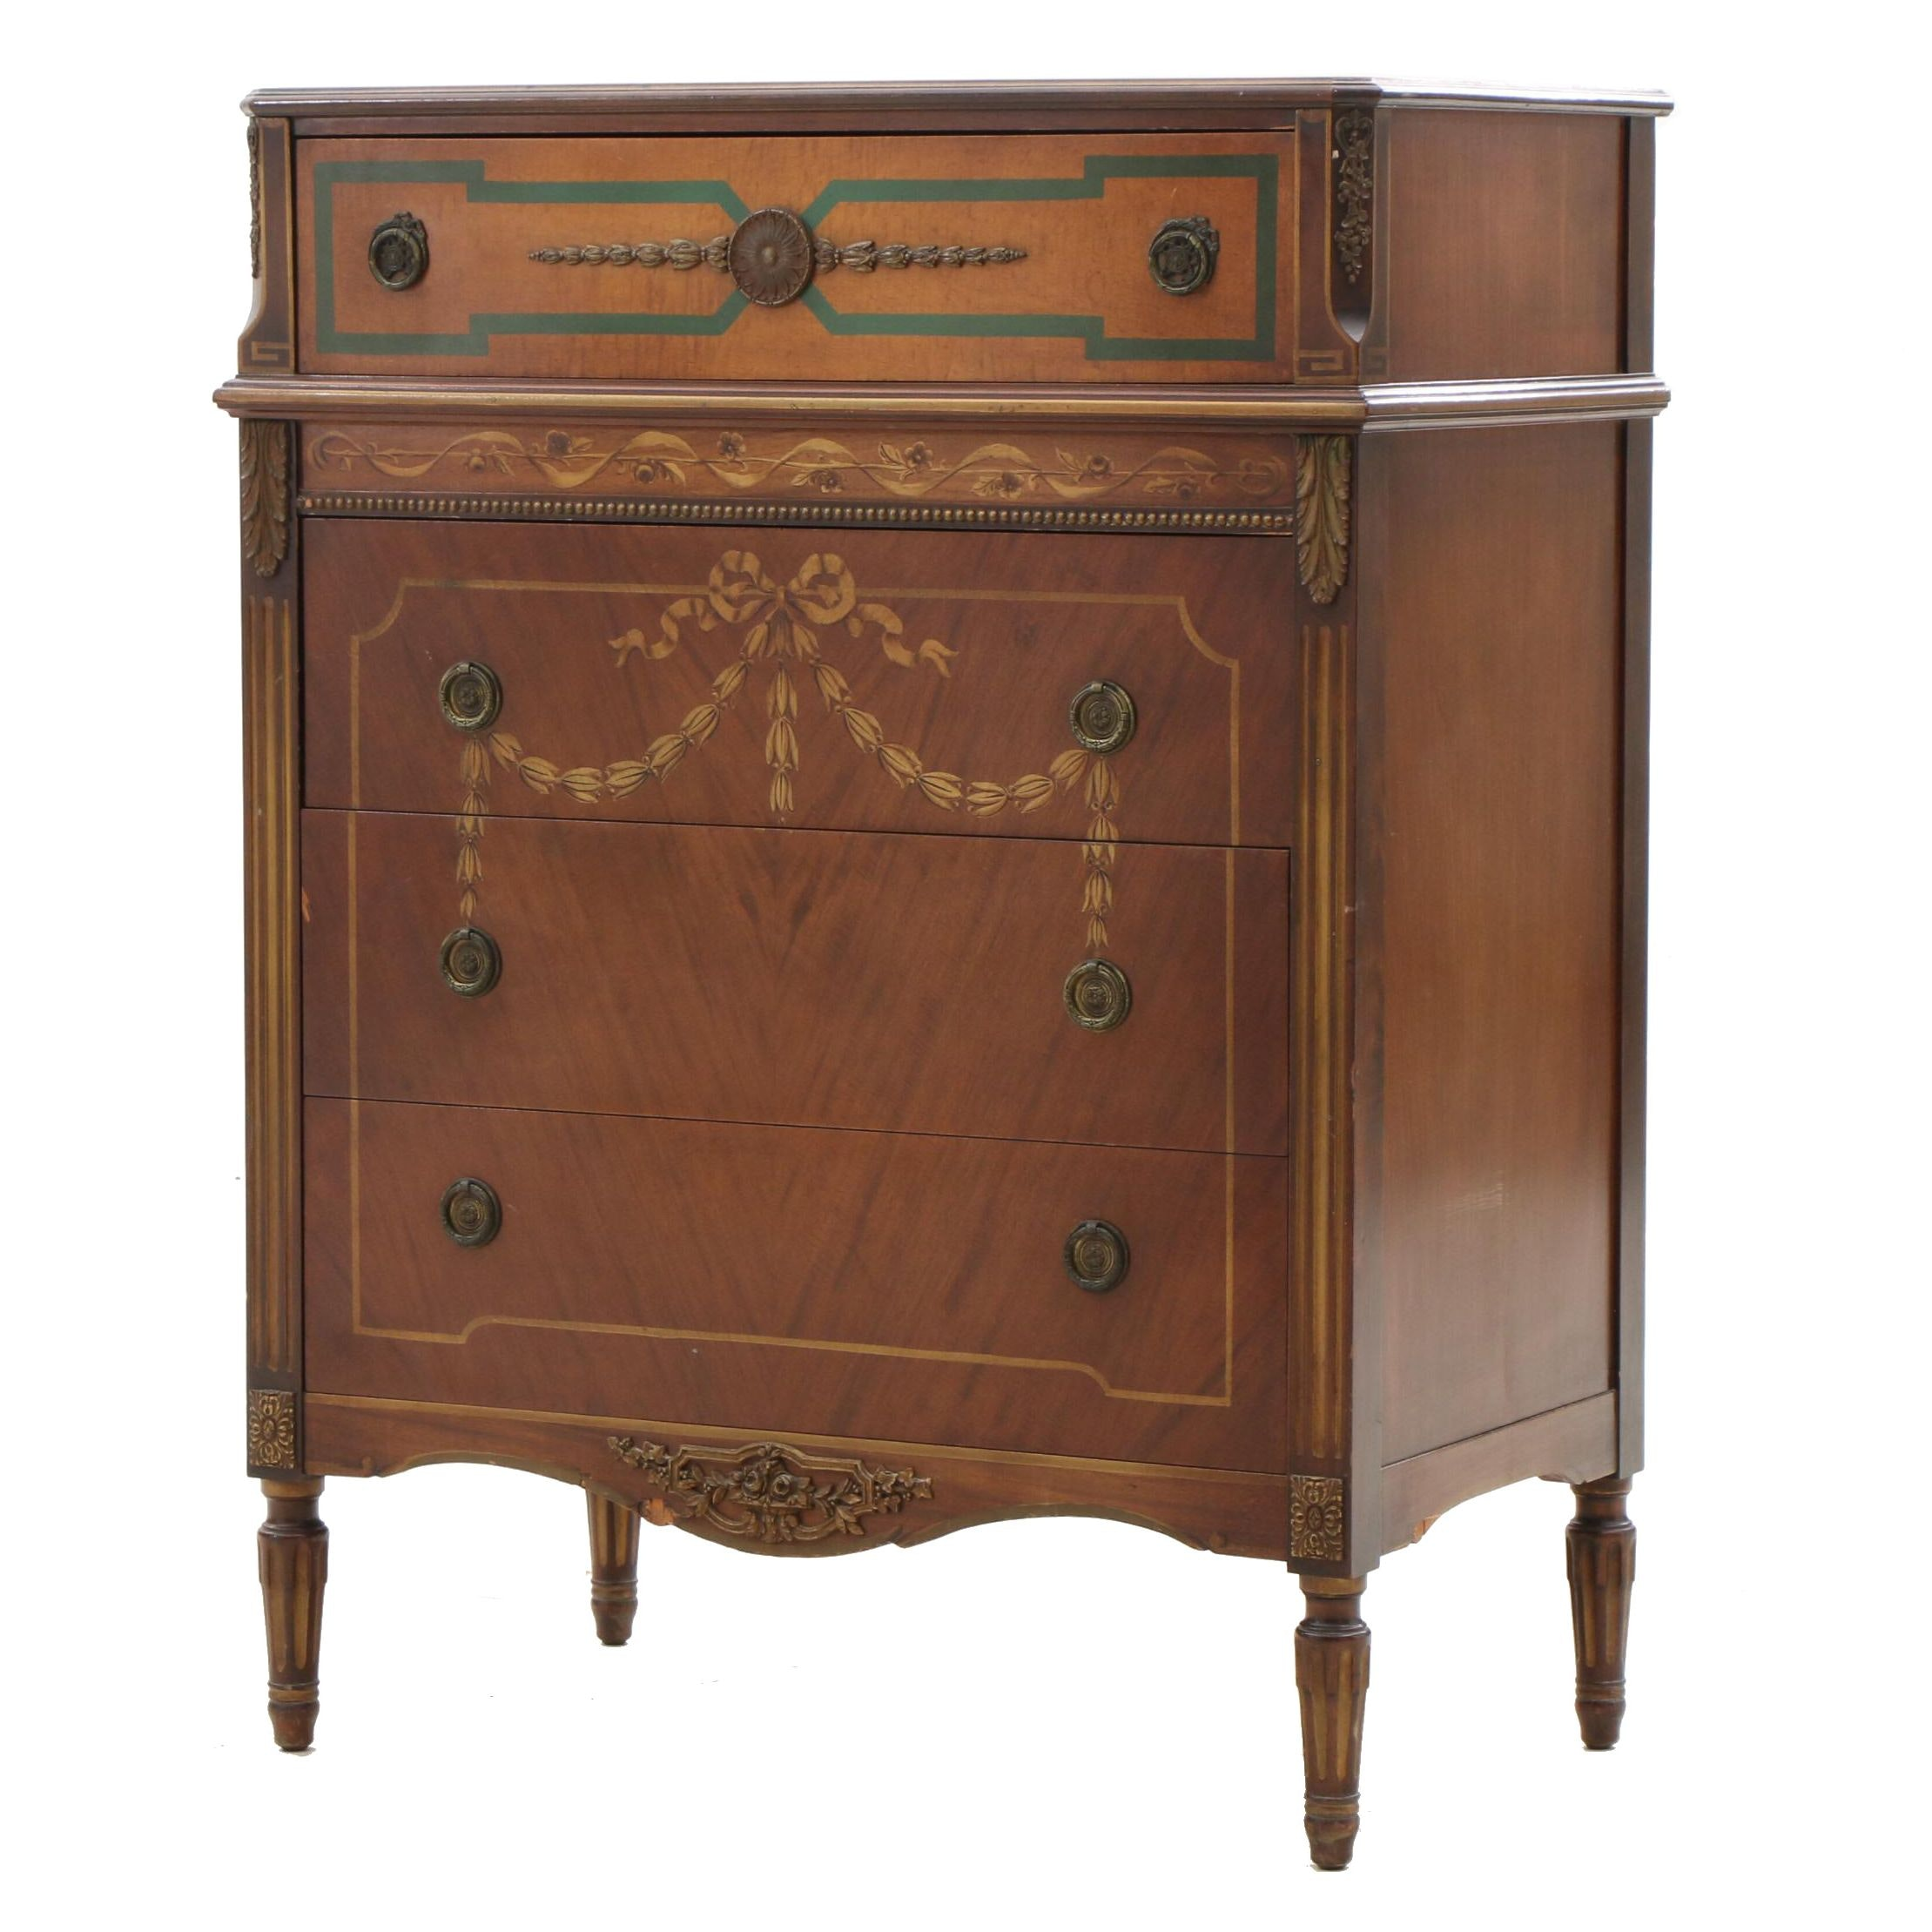 Furniture, Housewares & More